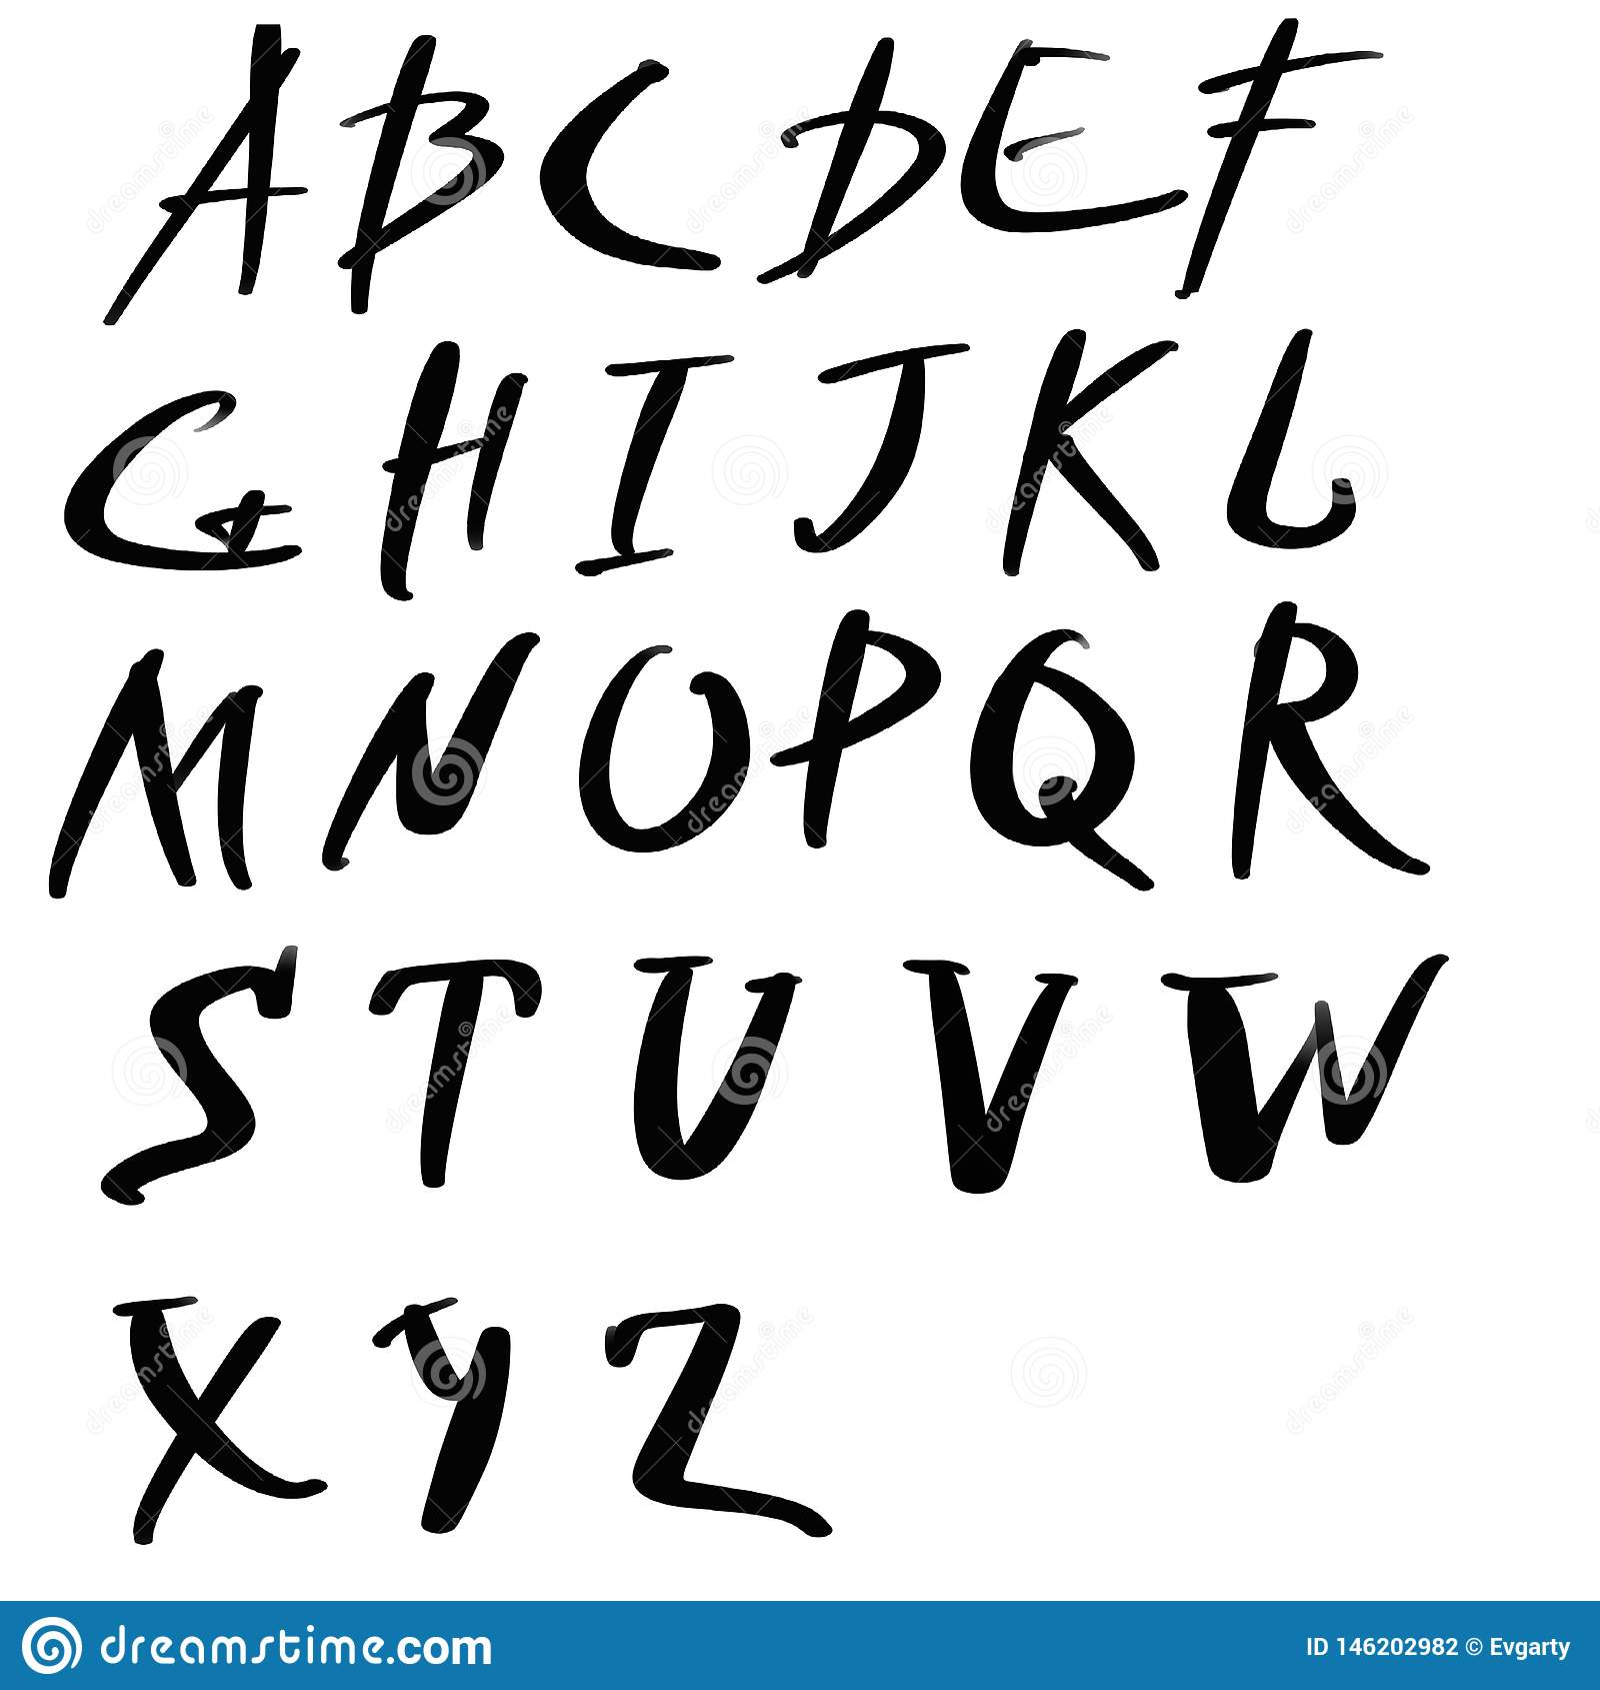 Handwritten Artistic Font Isolated Letters On White Background Hand Drawn Alphabet For Your Design Stock Illustration Illustration Of Handmade Home 146202982